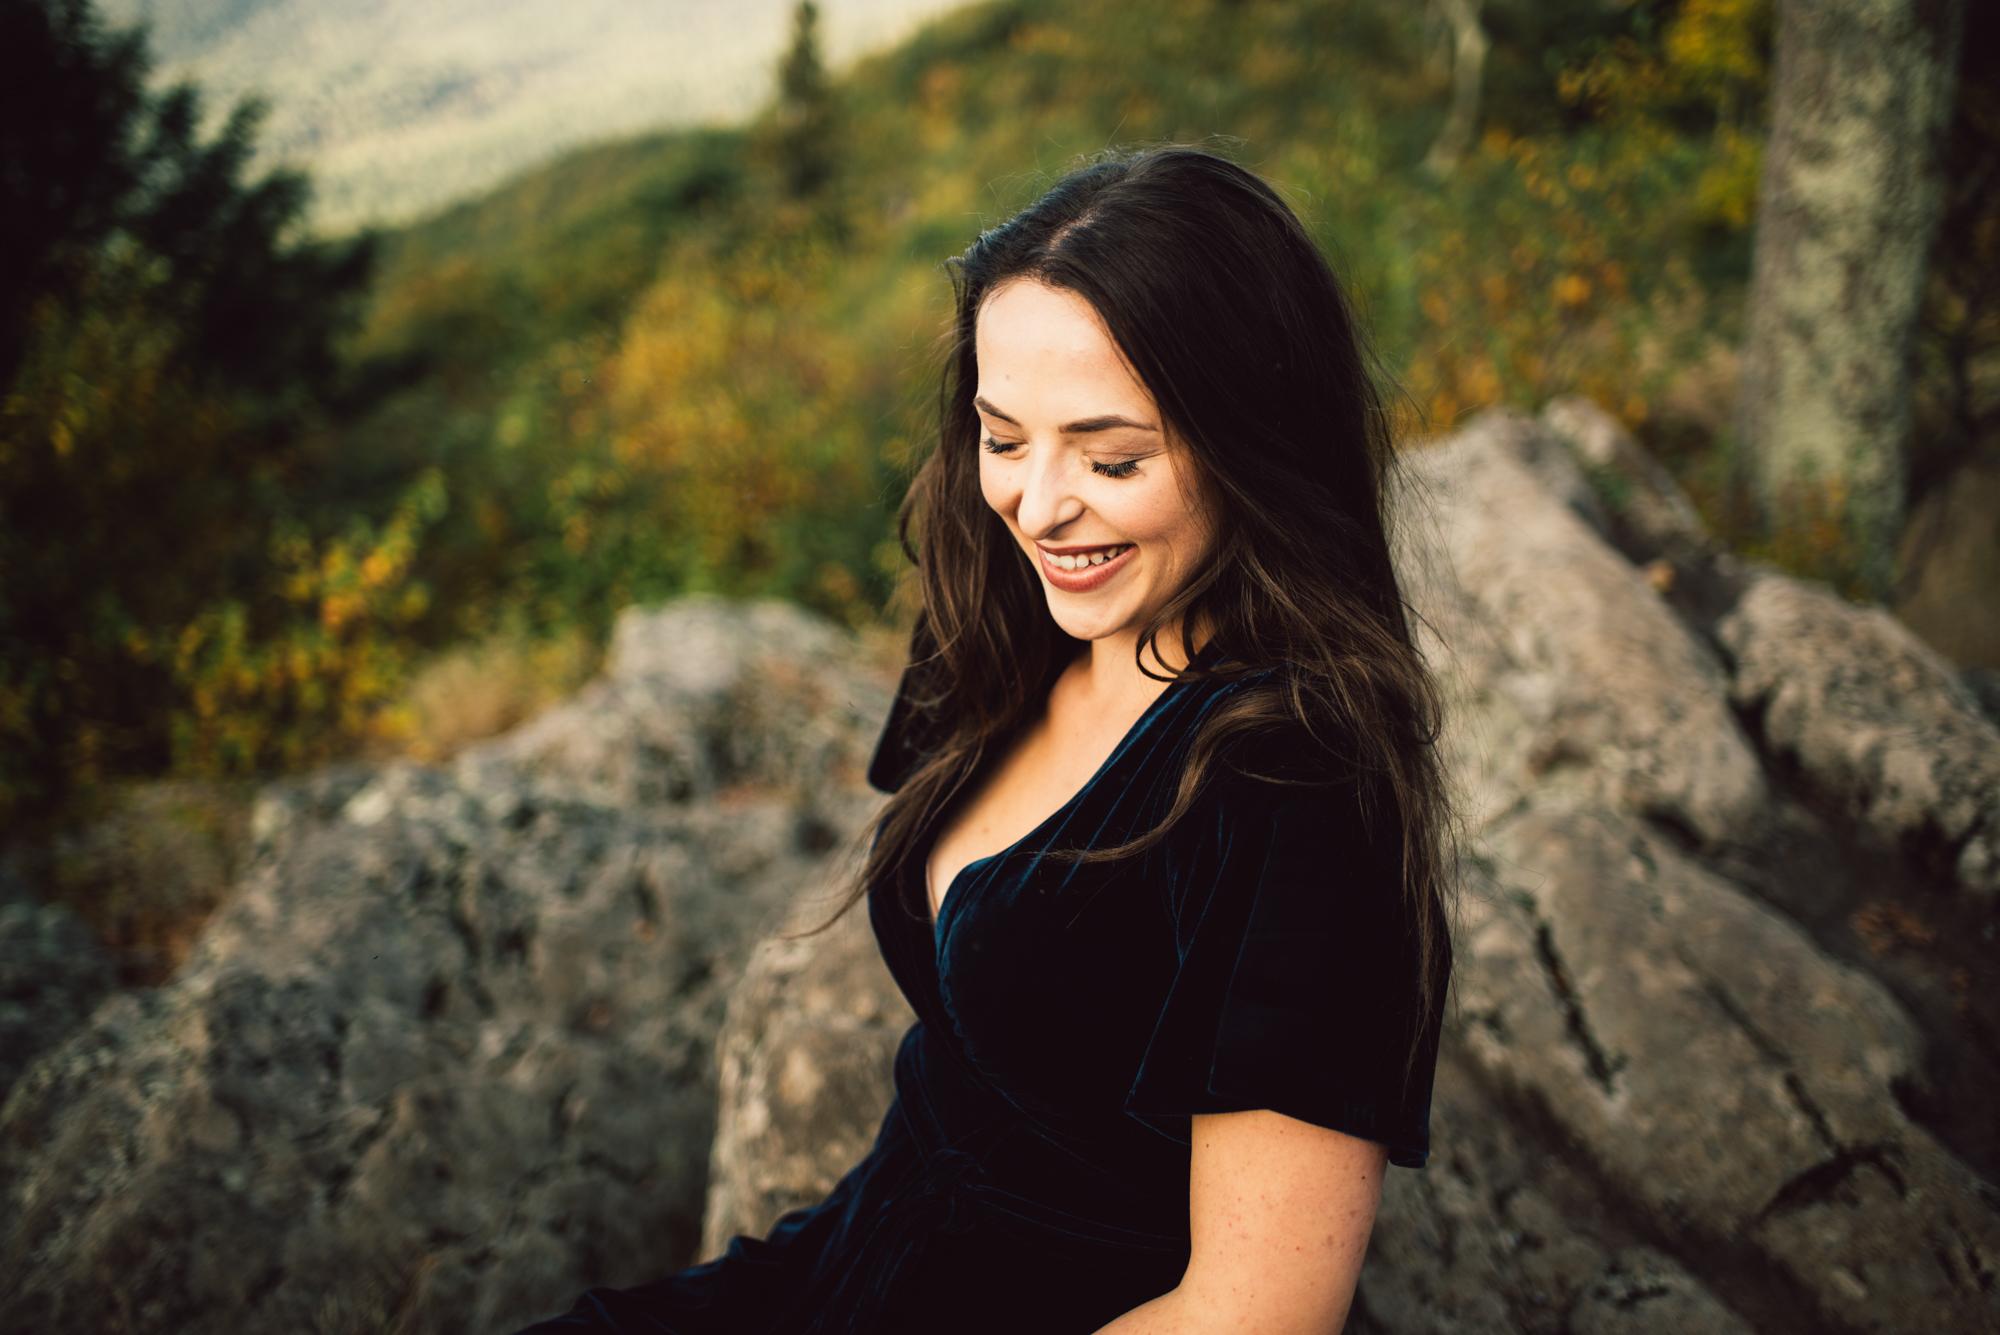 Megan_Shenandoah_National_Park_Windy_Romantic_Portraits_75.JPG